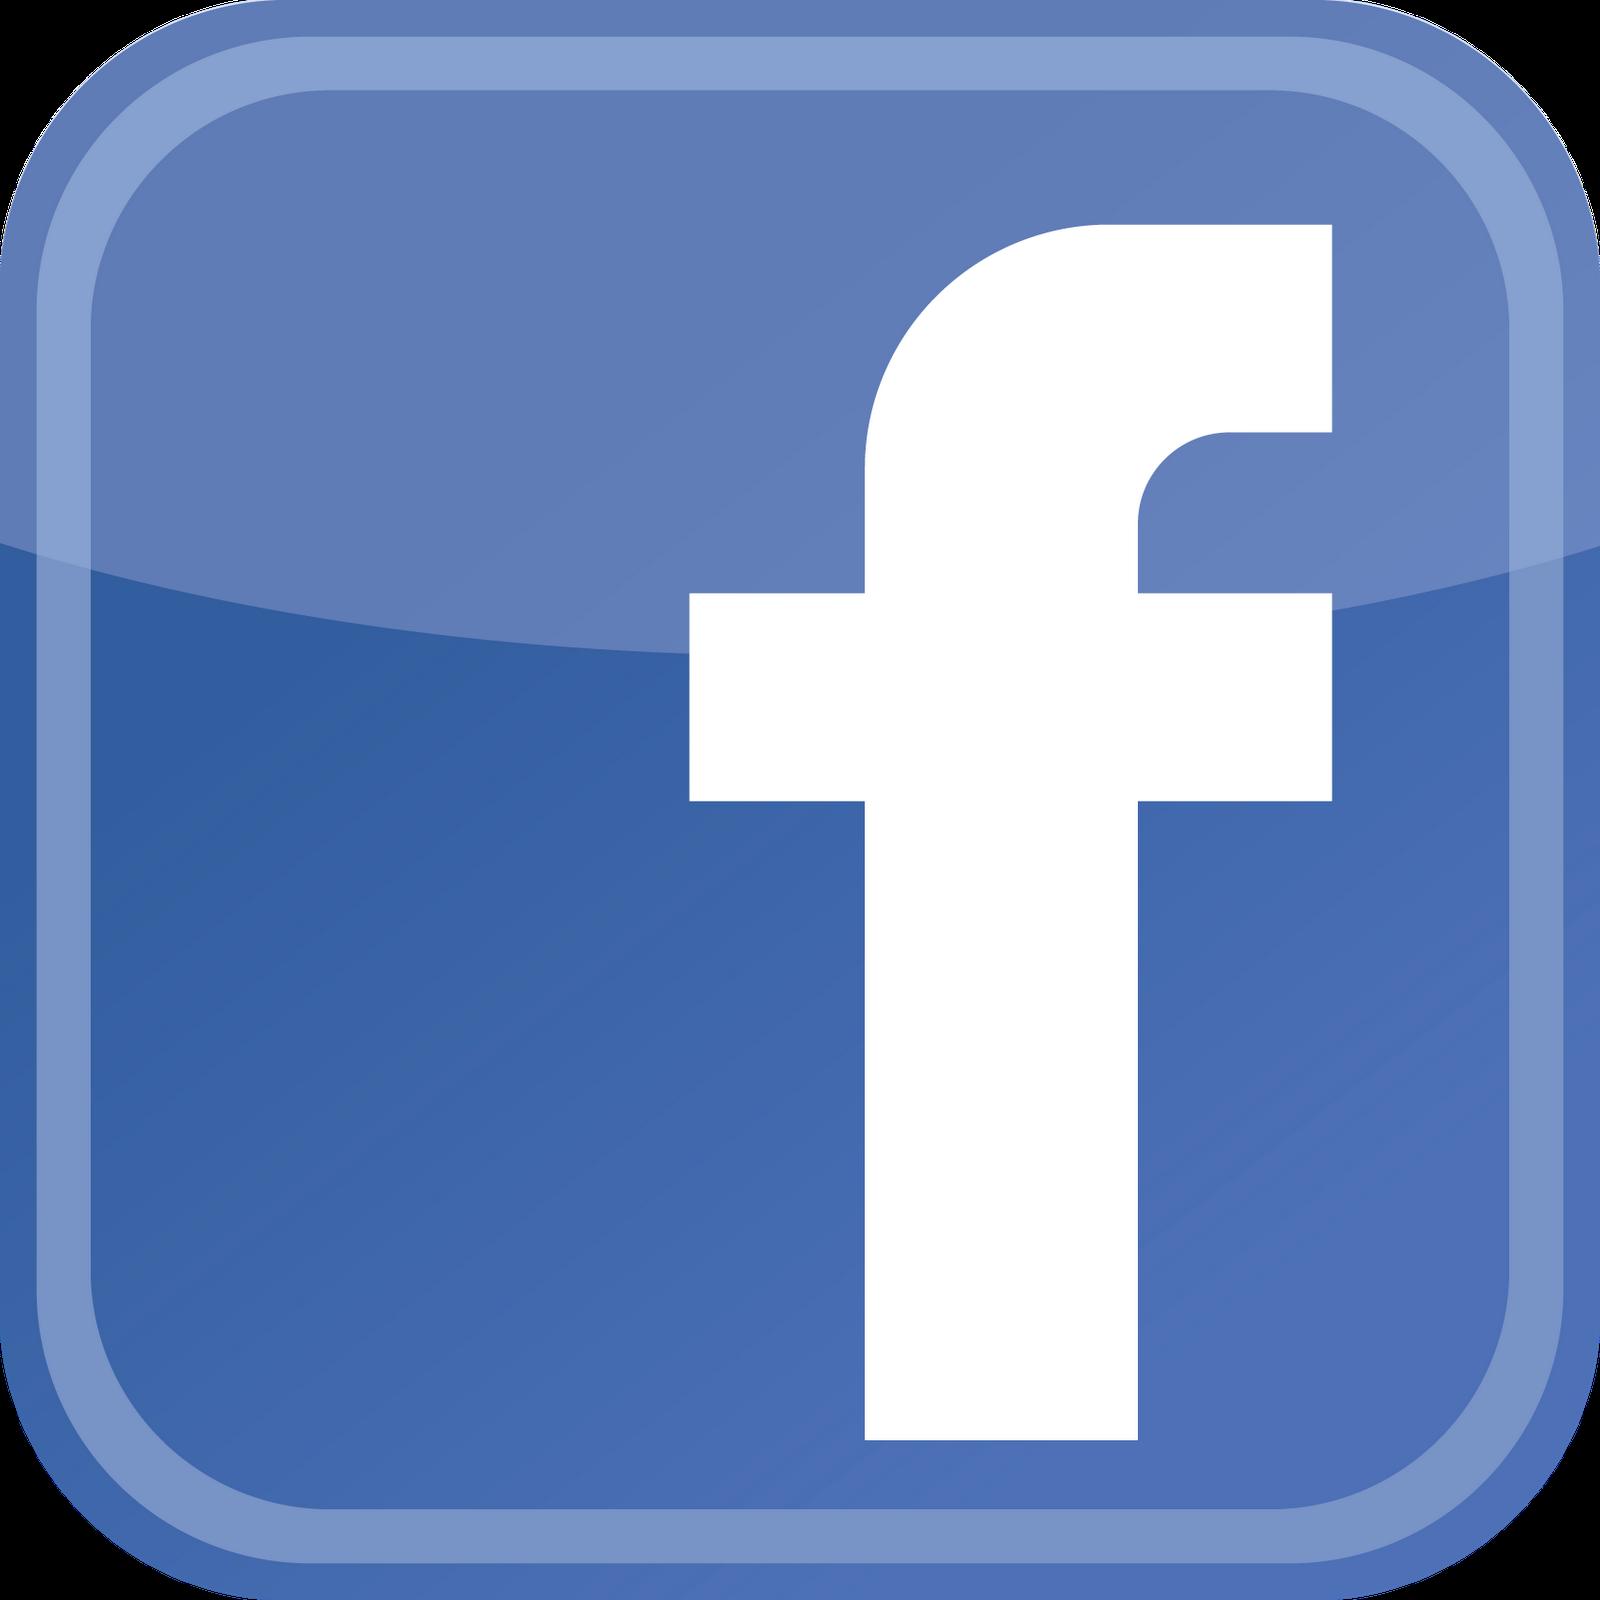 Facebook clipart teal. Free download clip art